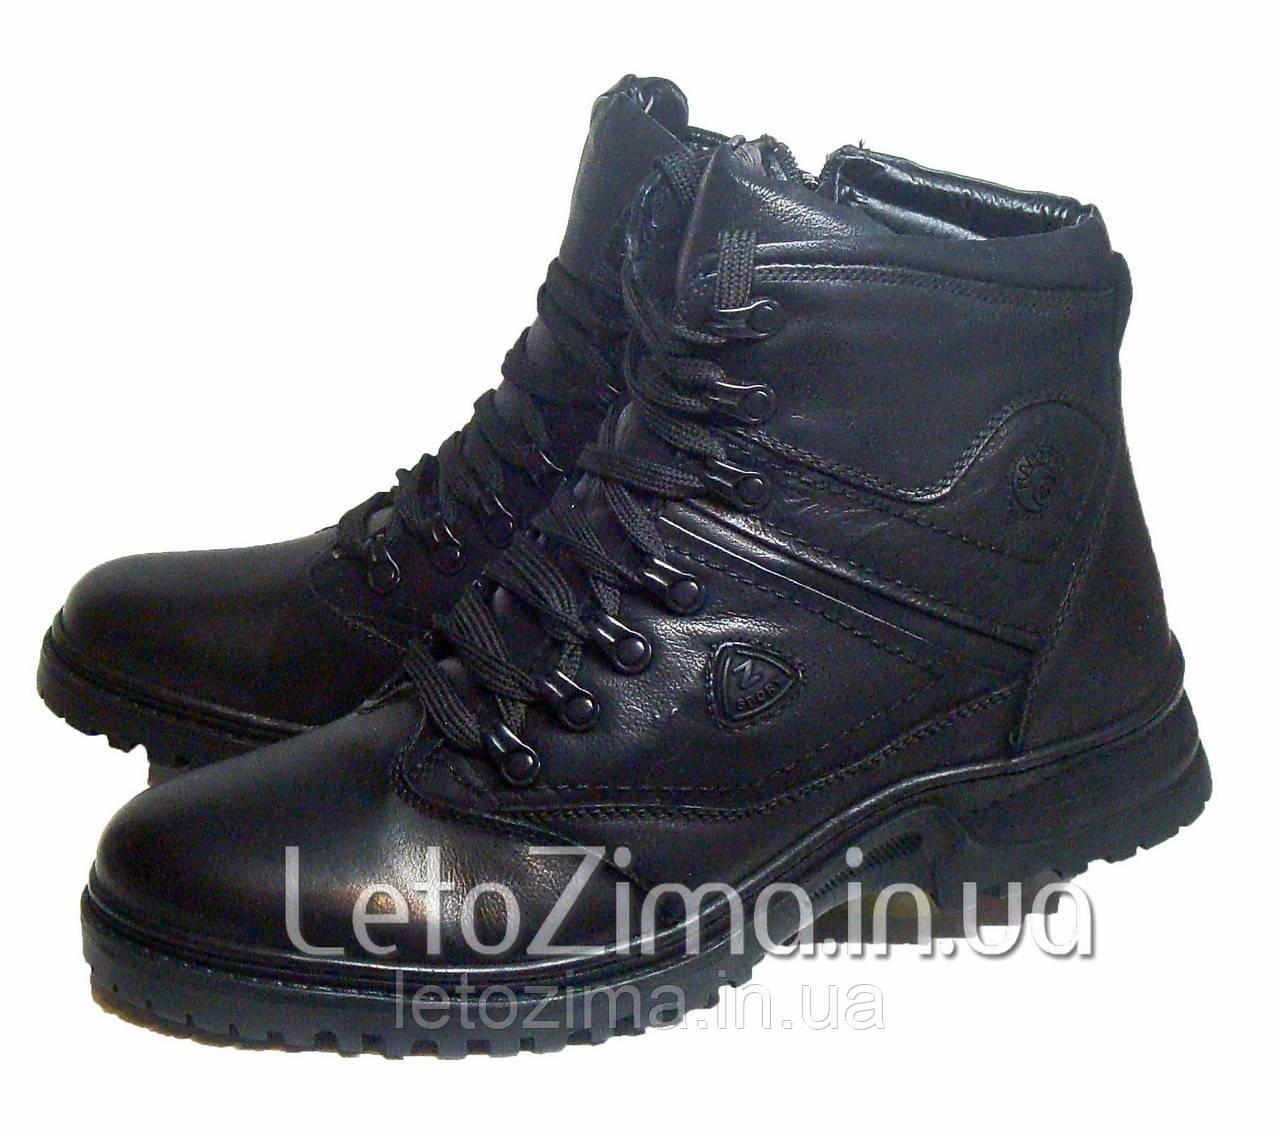 Мужская зимняя обувь р.42